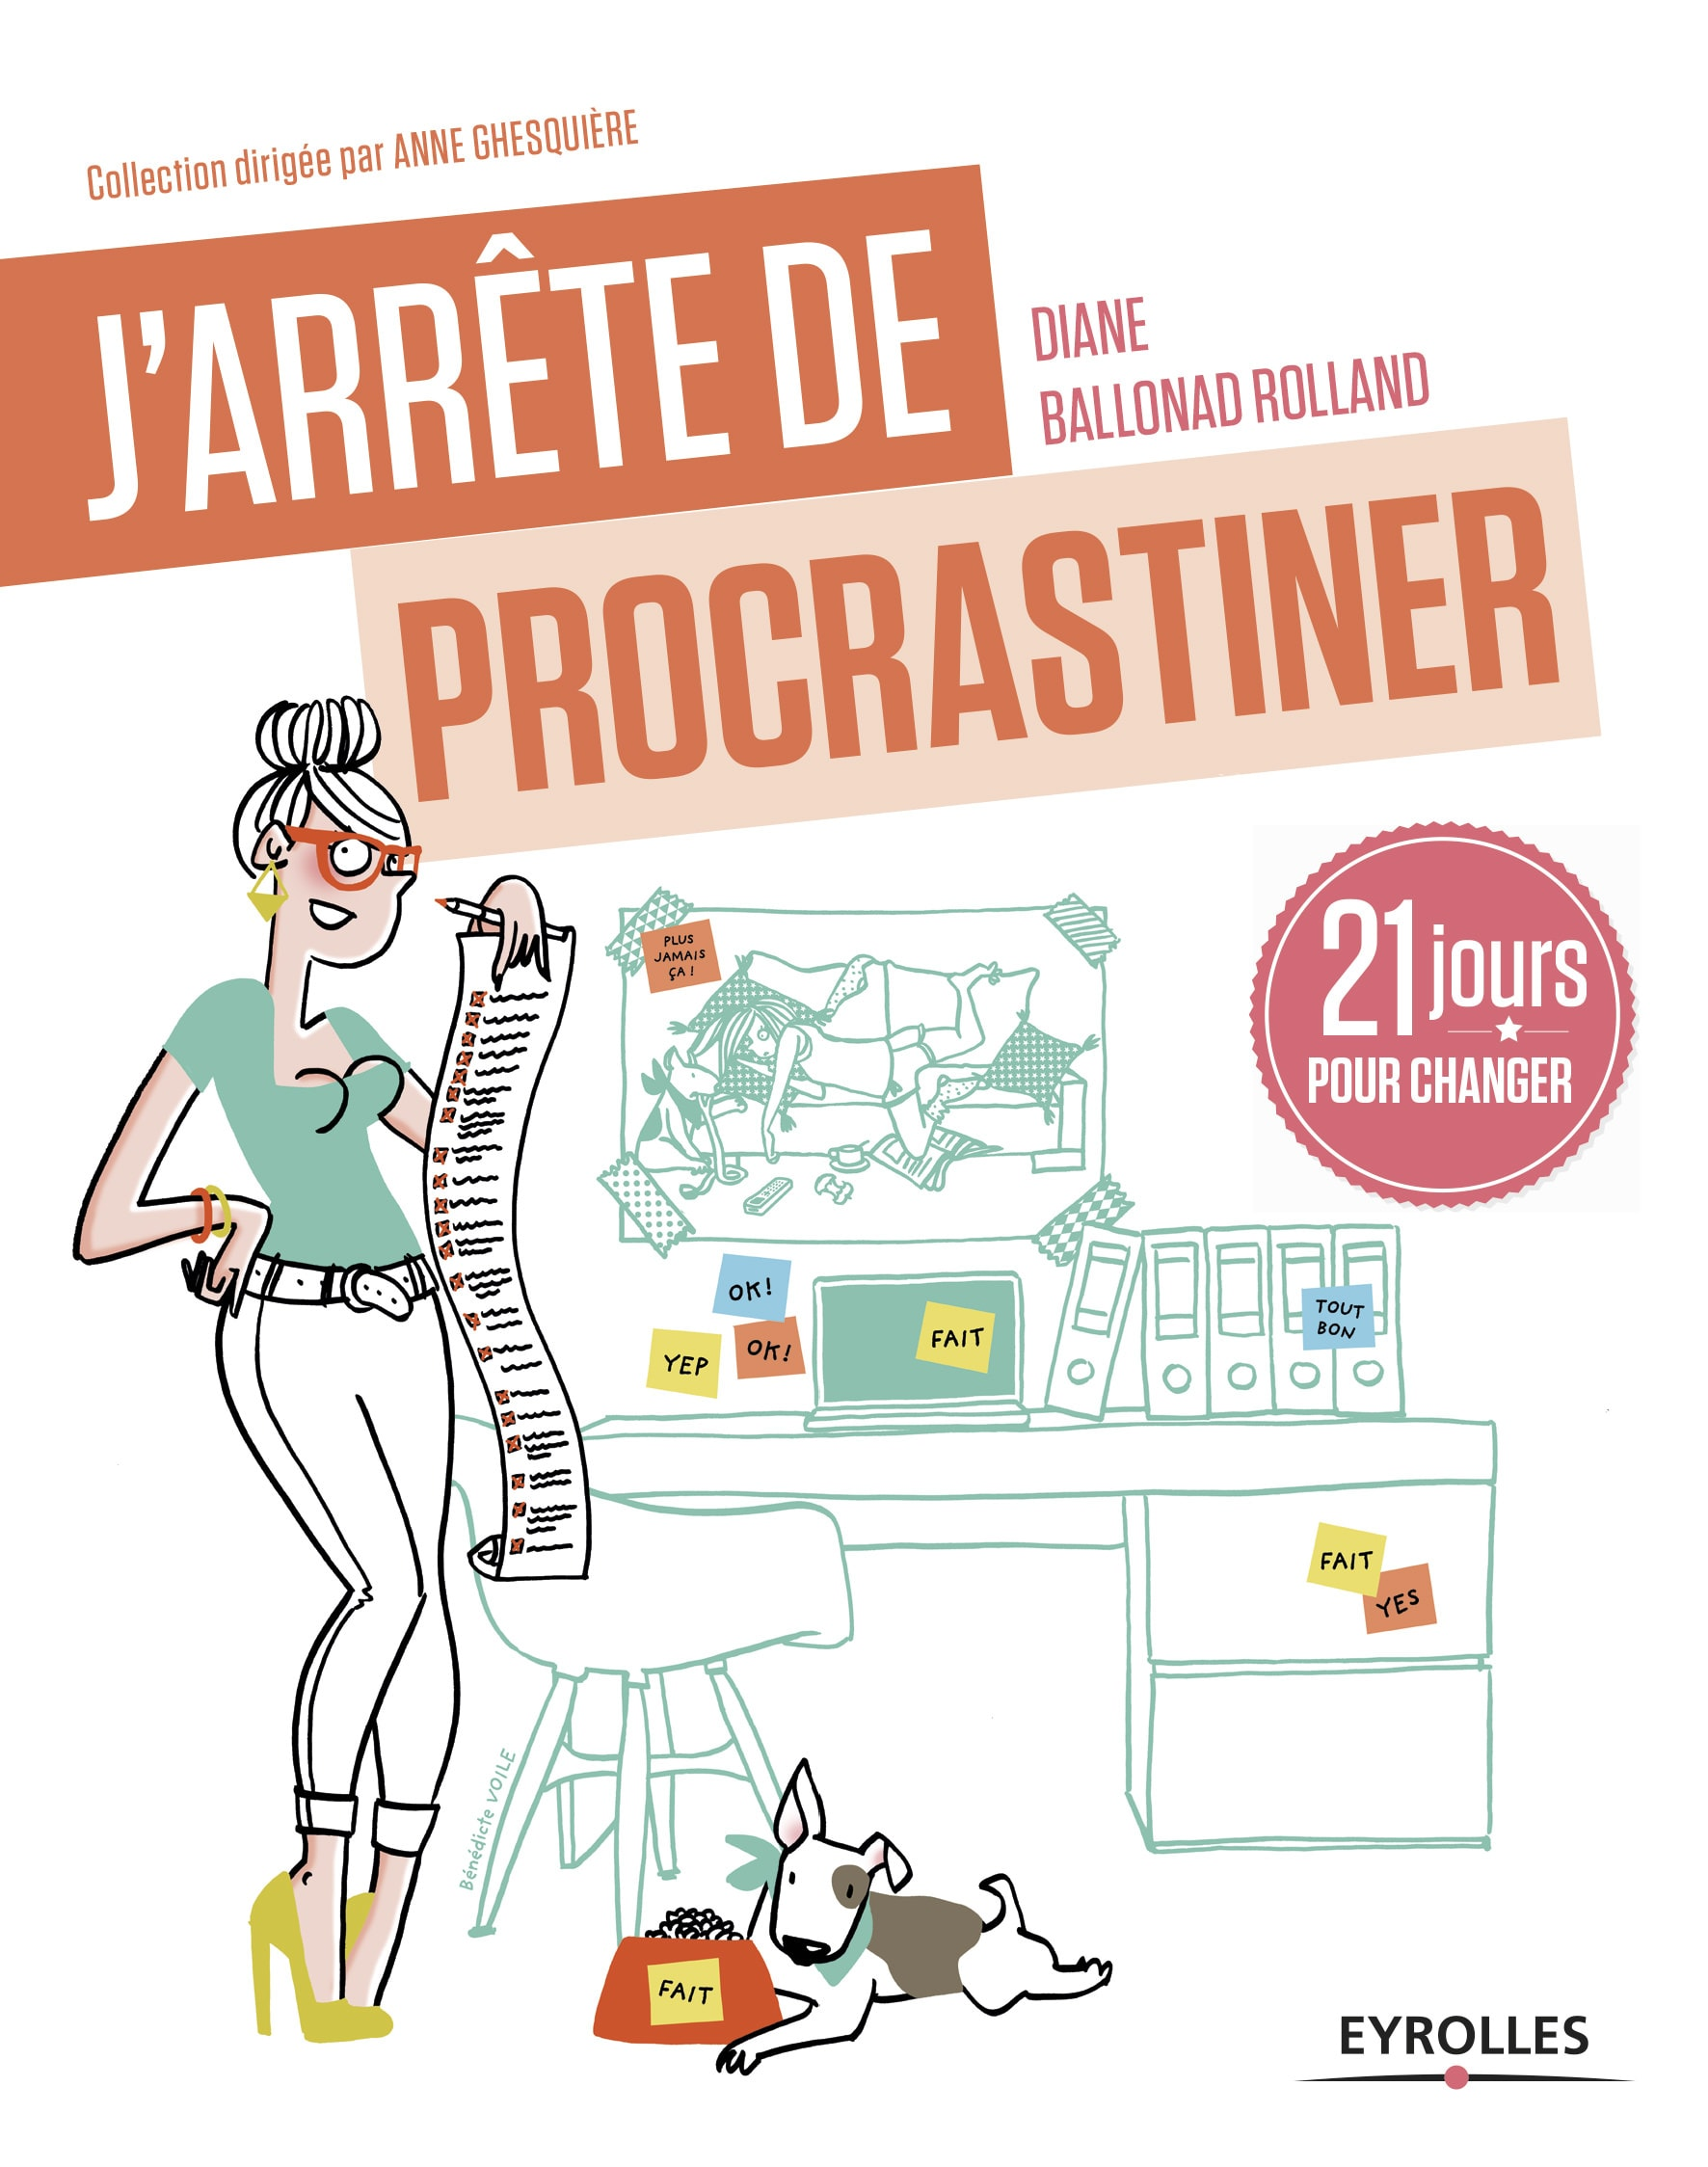 G56279_JarreteDeProcrastiner (4)